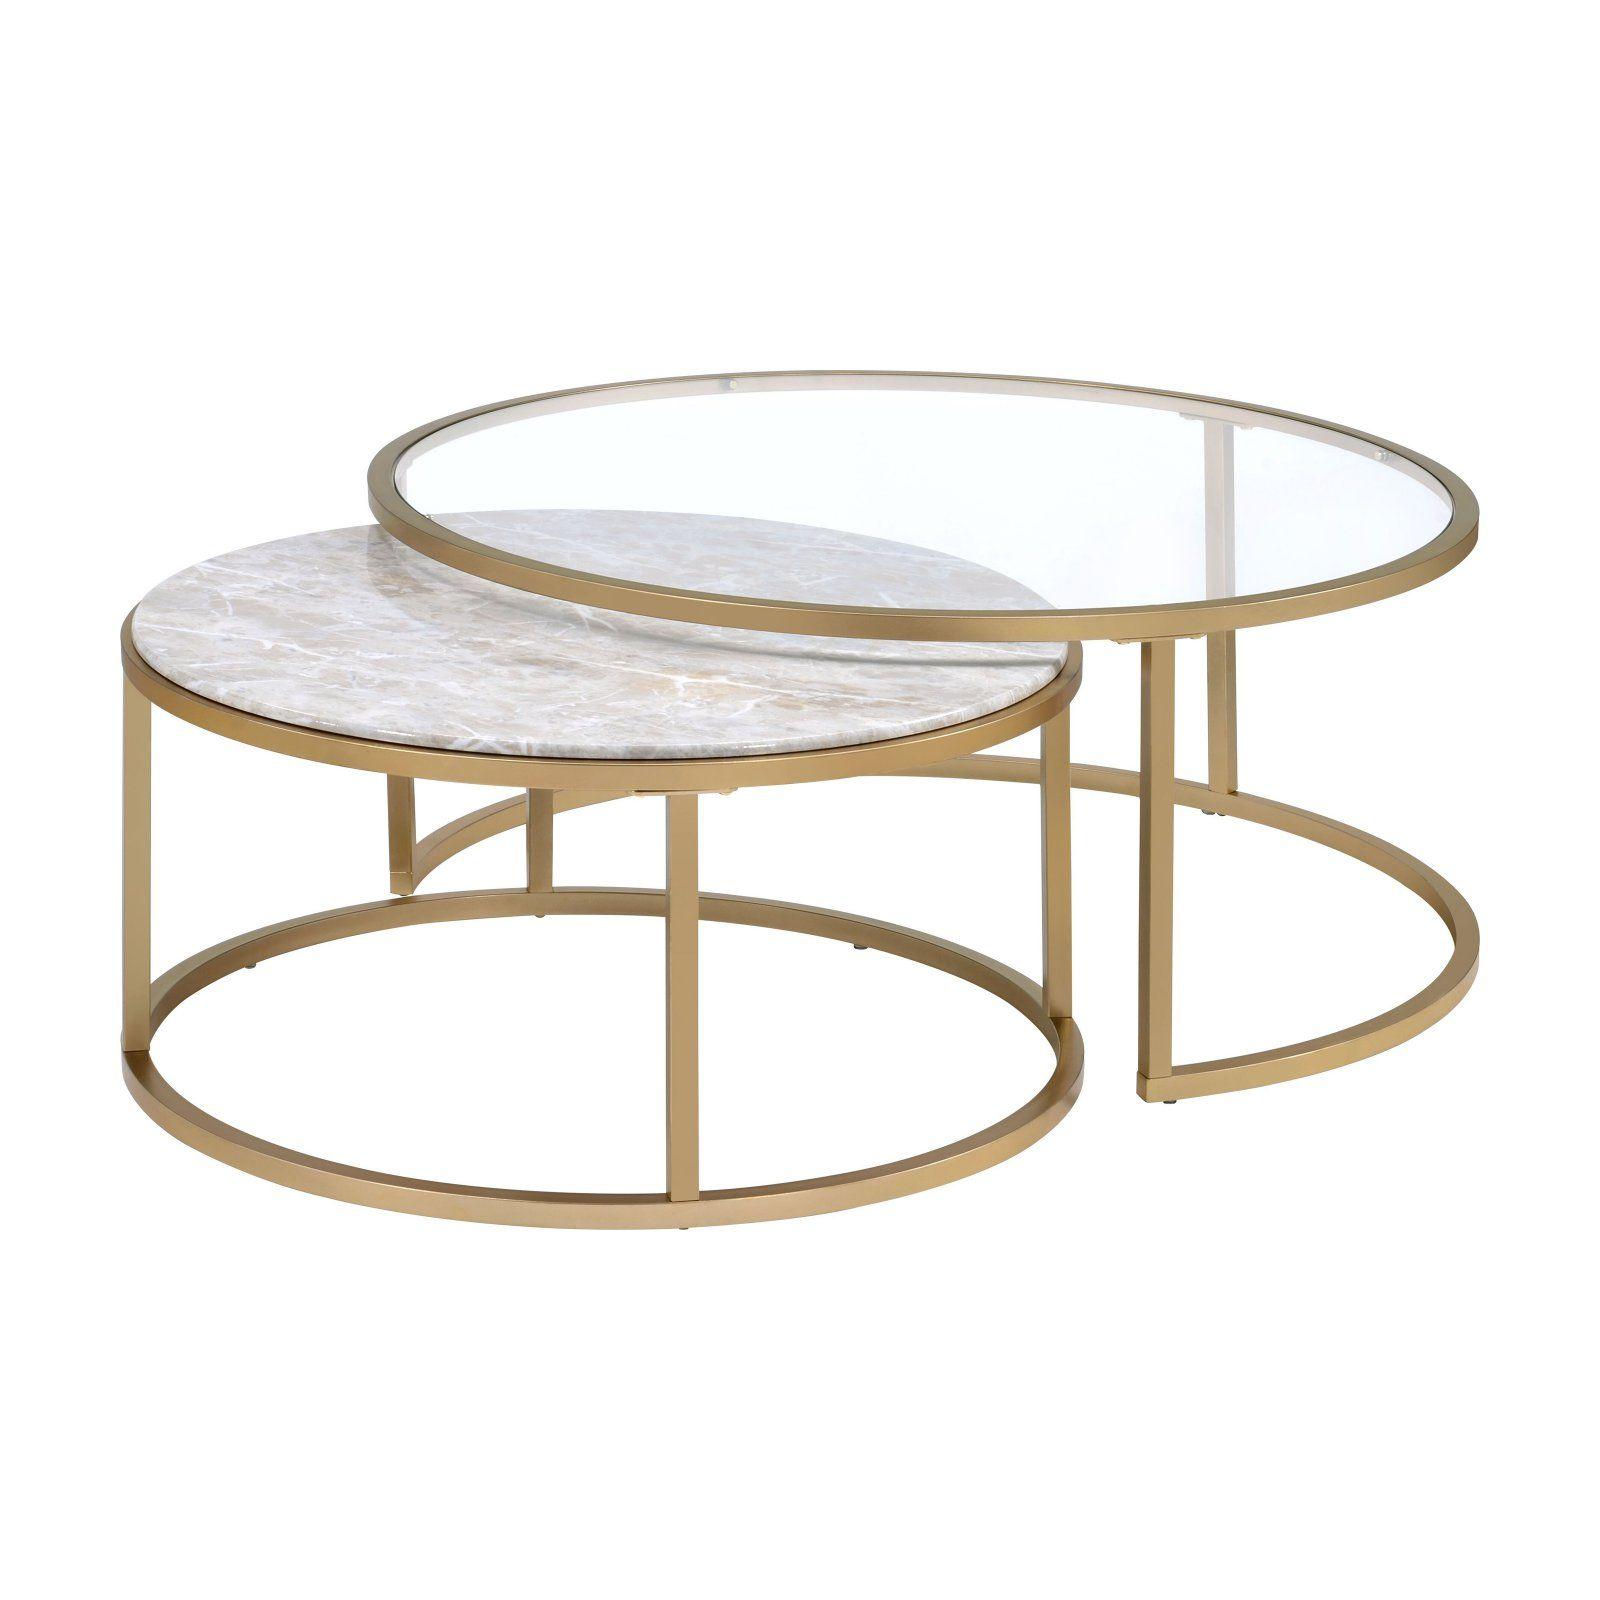 Acme Furniture Shanish 2 Piece Nesting Coffee Table Set Nesting Coffee Tables Gold Nesting Coffee Table Round Coffee Table Sets [ 1600 x 1600 Pixel ]